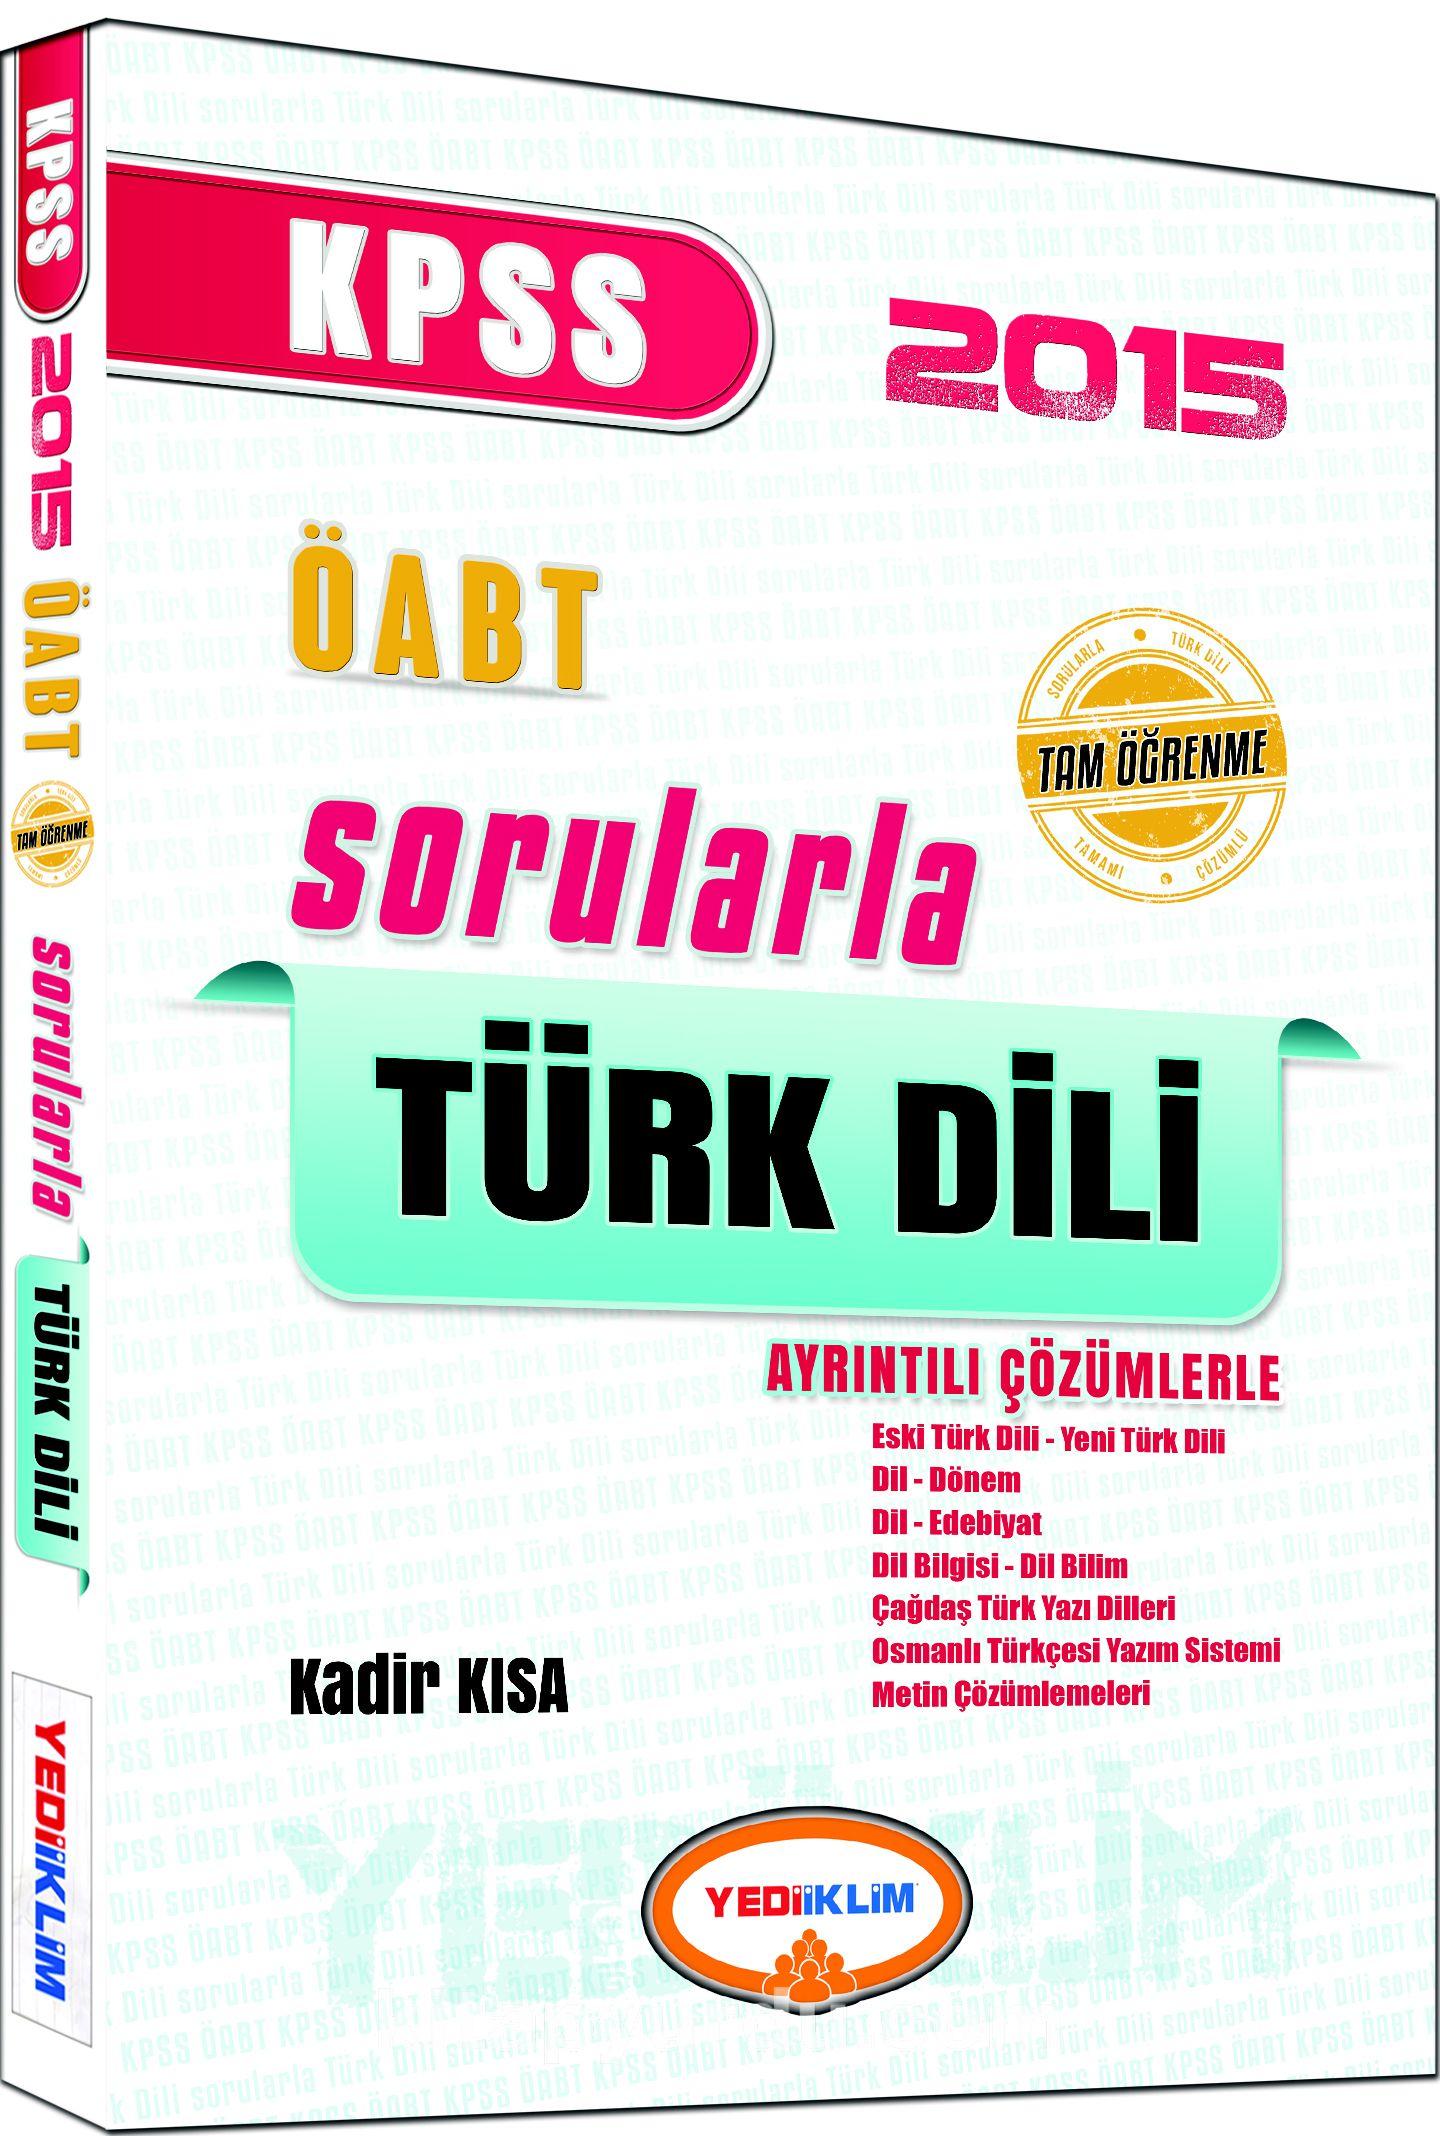 2015 KPSS ÖABT Tamamı Çözümlü Sorularla Türk Dili - Kadir Kısa pdf epub